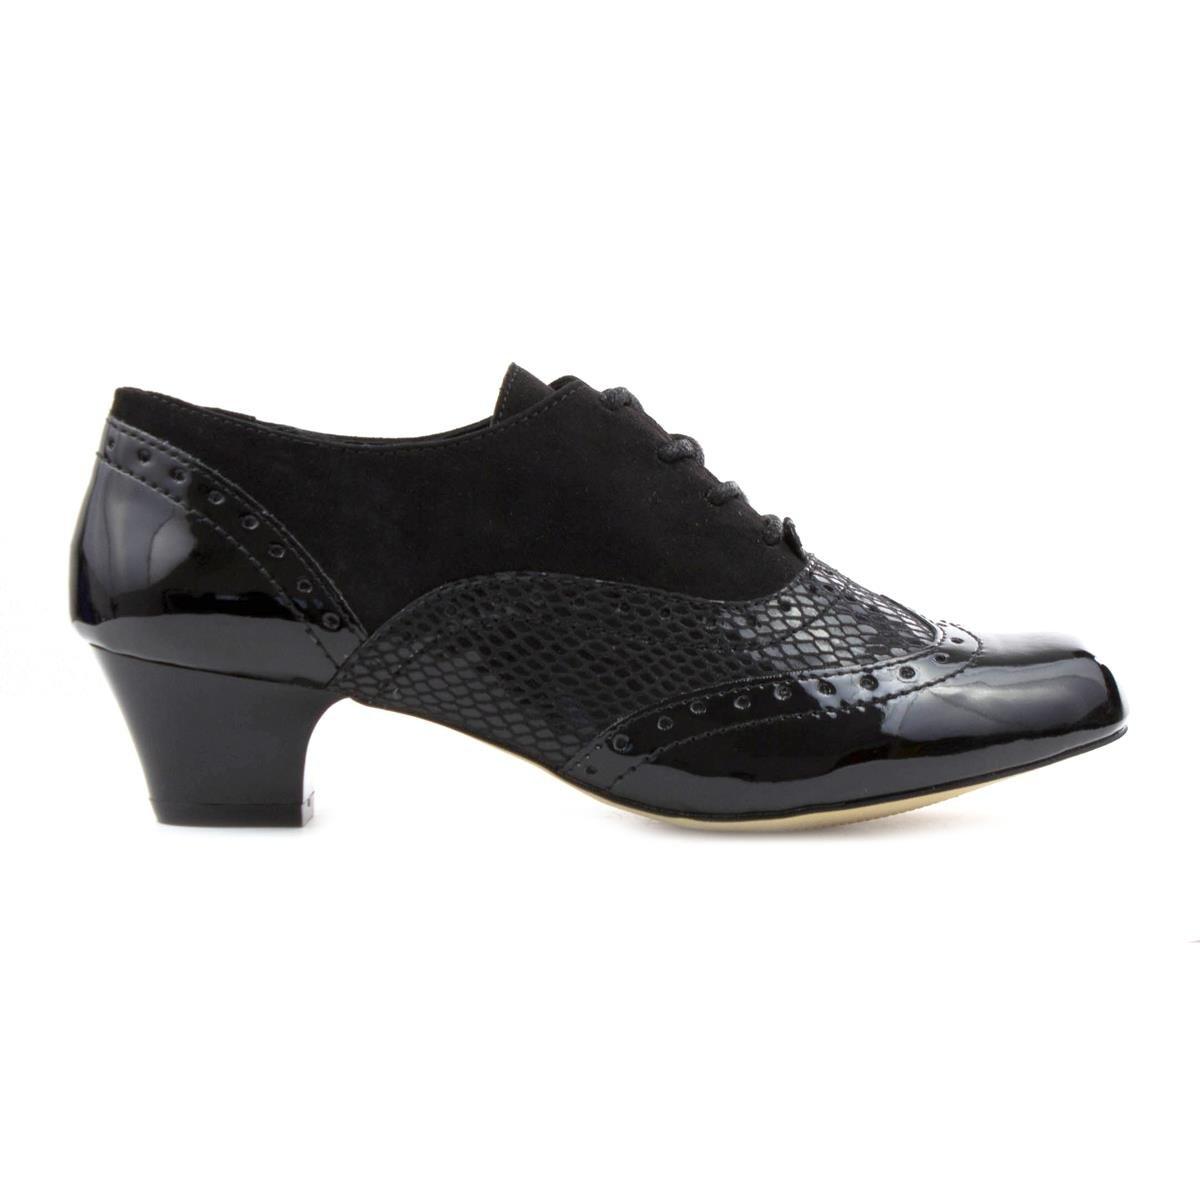 5 Femme Richelieu 35 Lotus Chaussures Noir Noir wf1vX5Saq